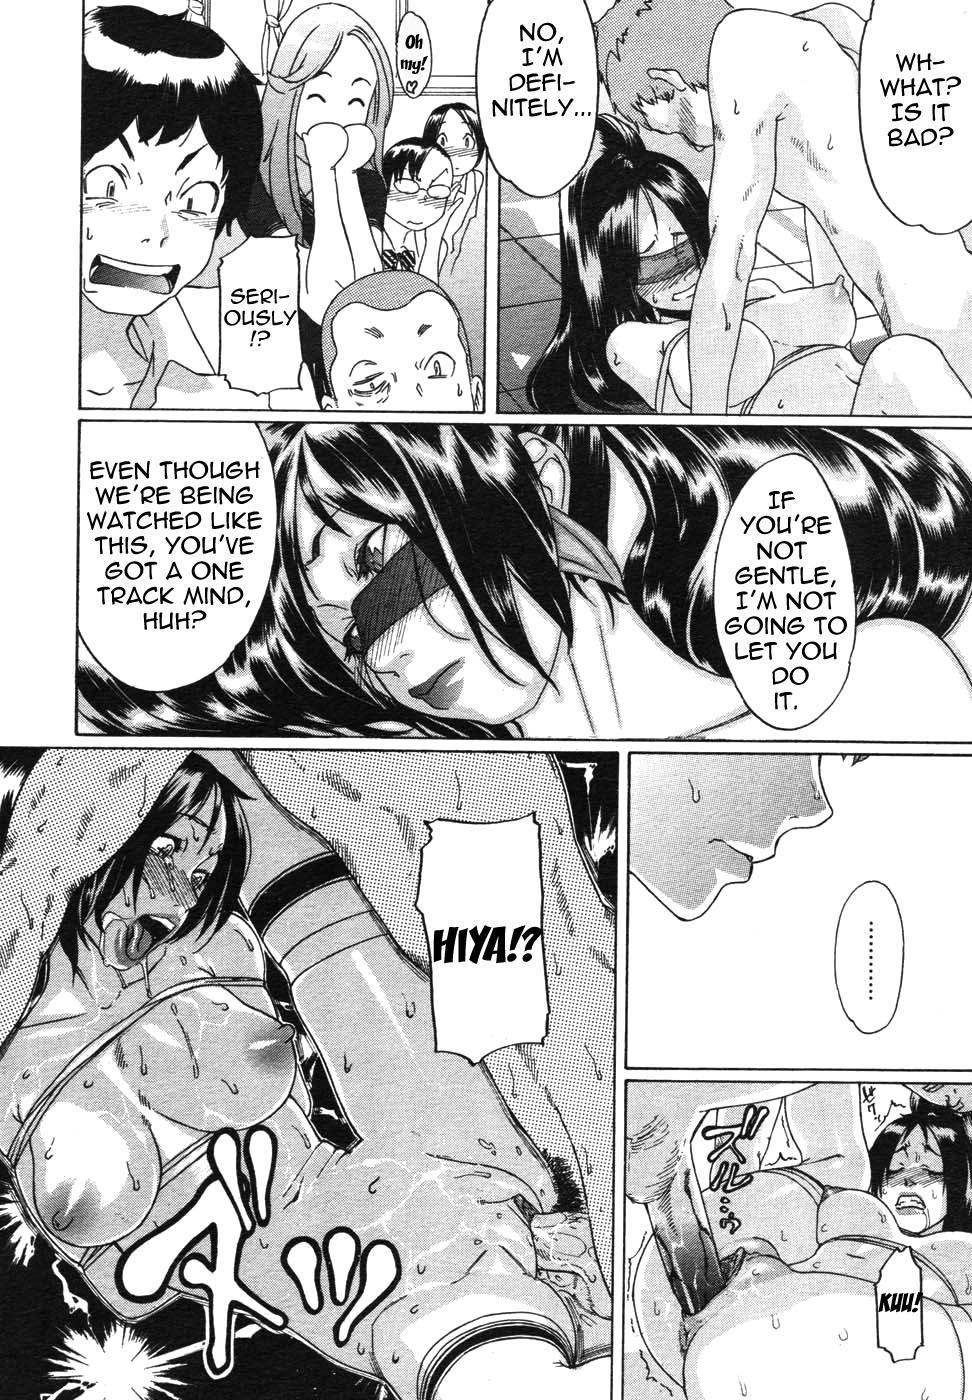 [Royal Koyanagi] Milky Shot! (School Is Crazy these Days) Ch.1-2 [English] 45